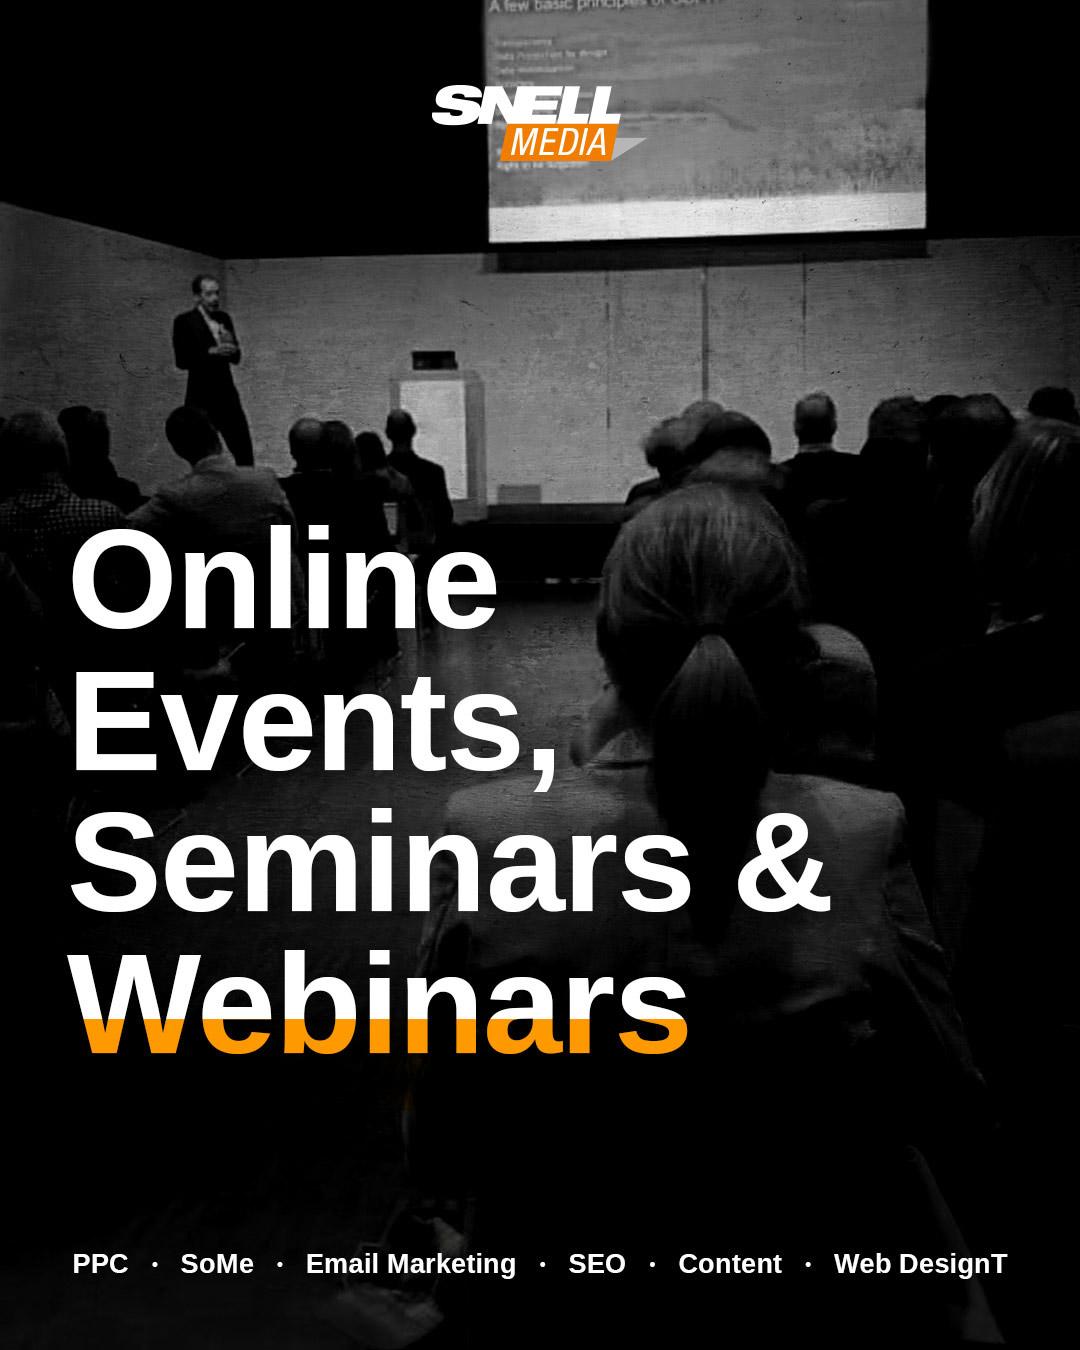 Online Events, Seminars & Webinars 9th B2B Digital Marketing Trend